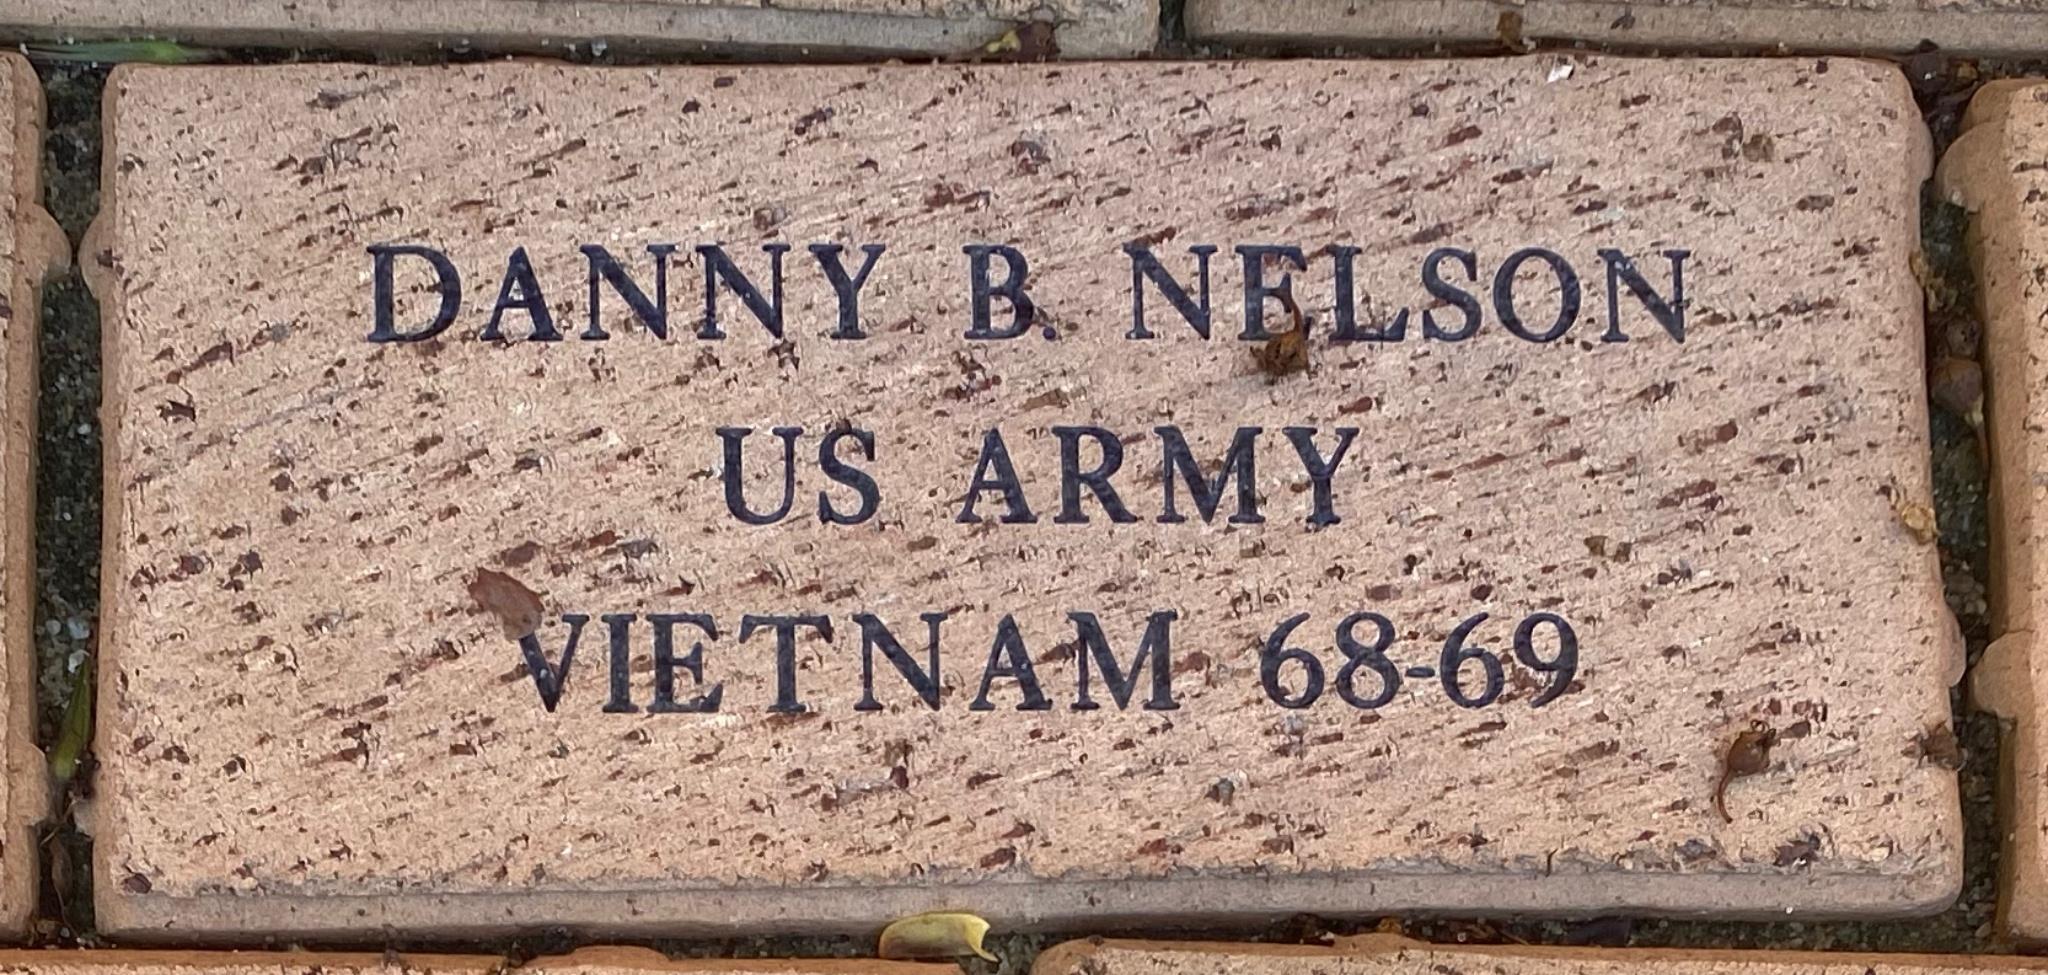 DANNY B. NELSON US ARMY VIETNAM 68-69